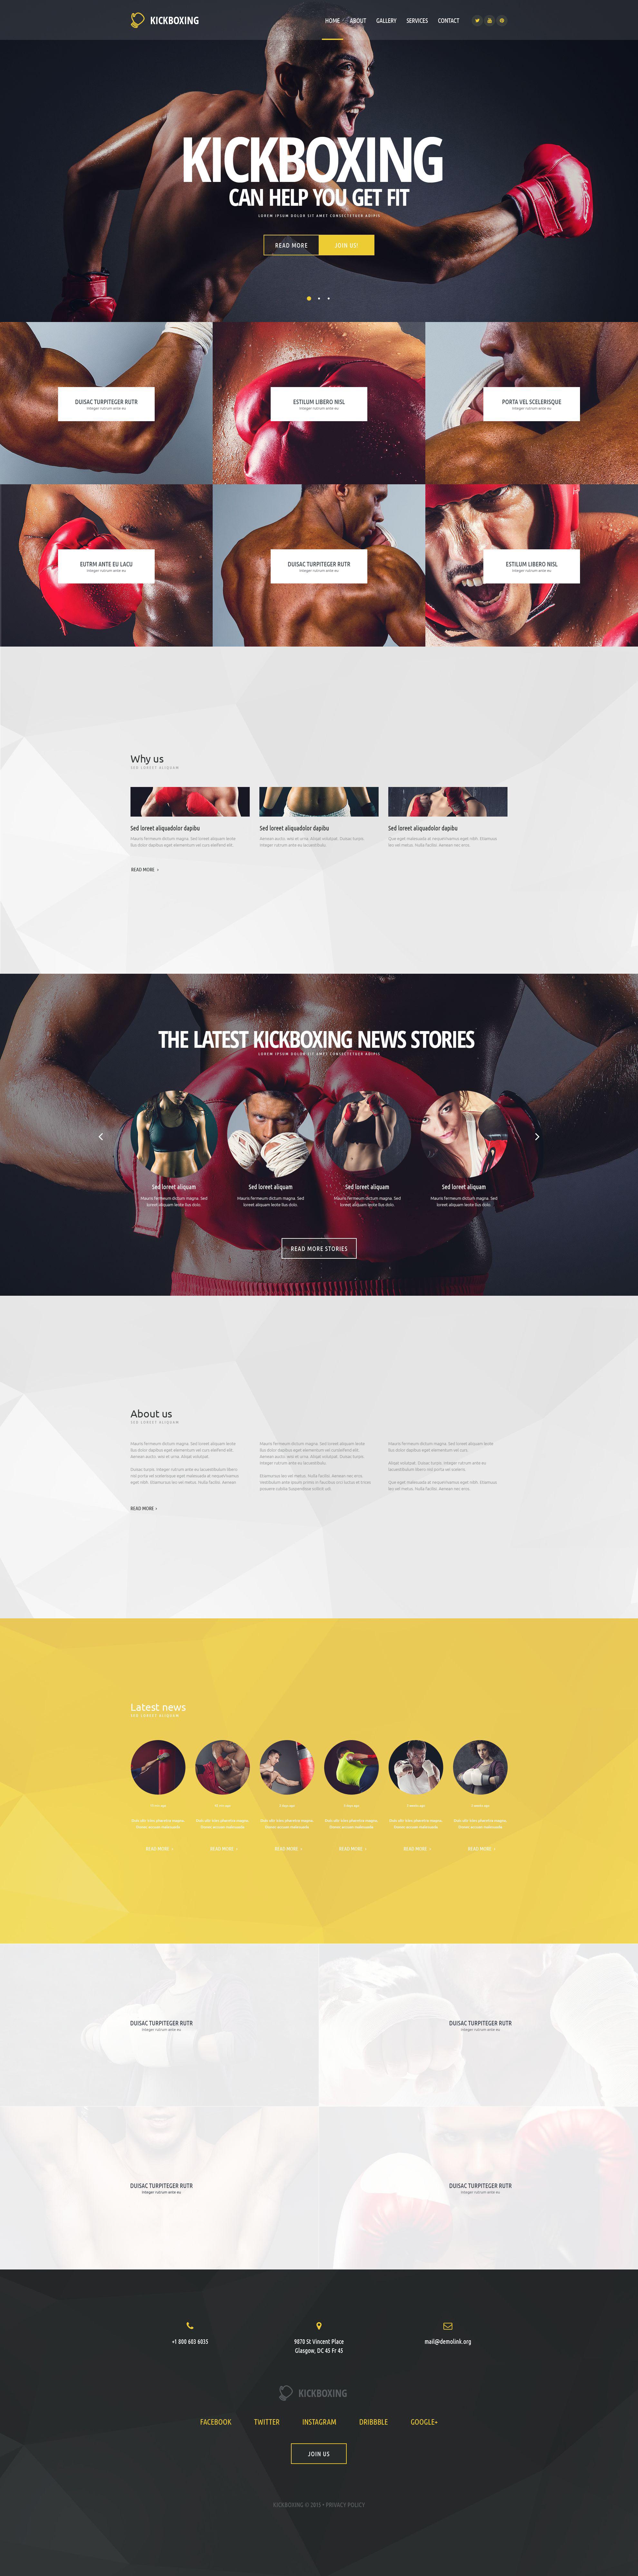 Reszponzív Kickboxing Weboldal sablon 54569